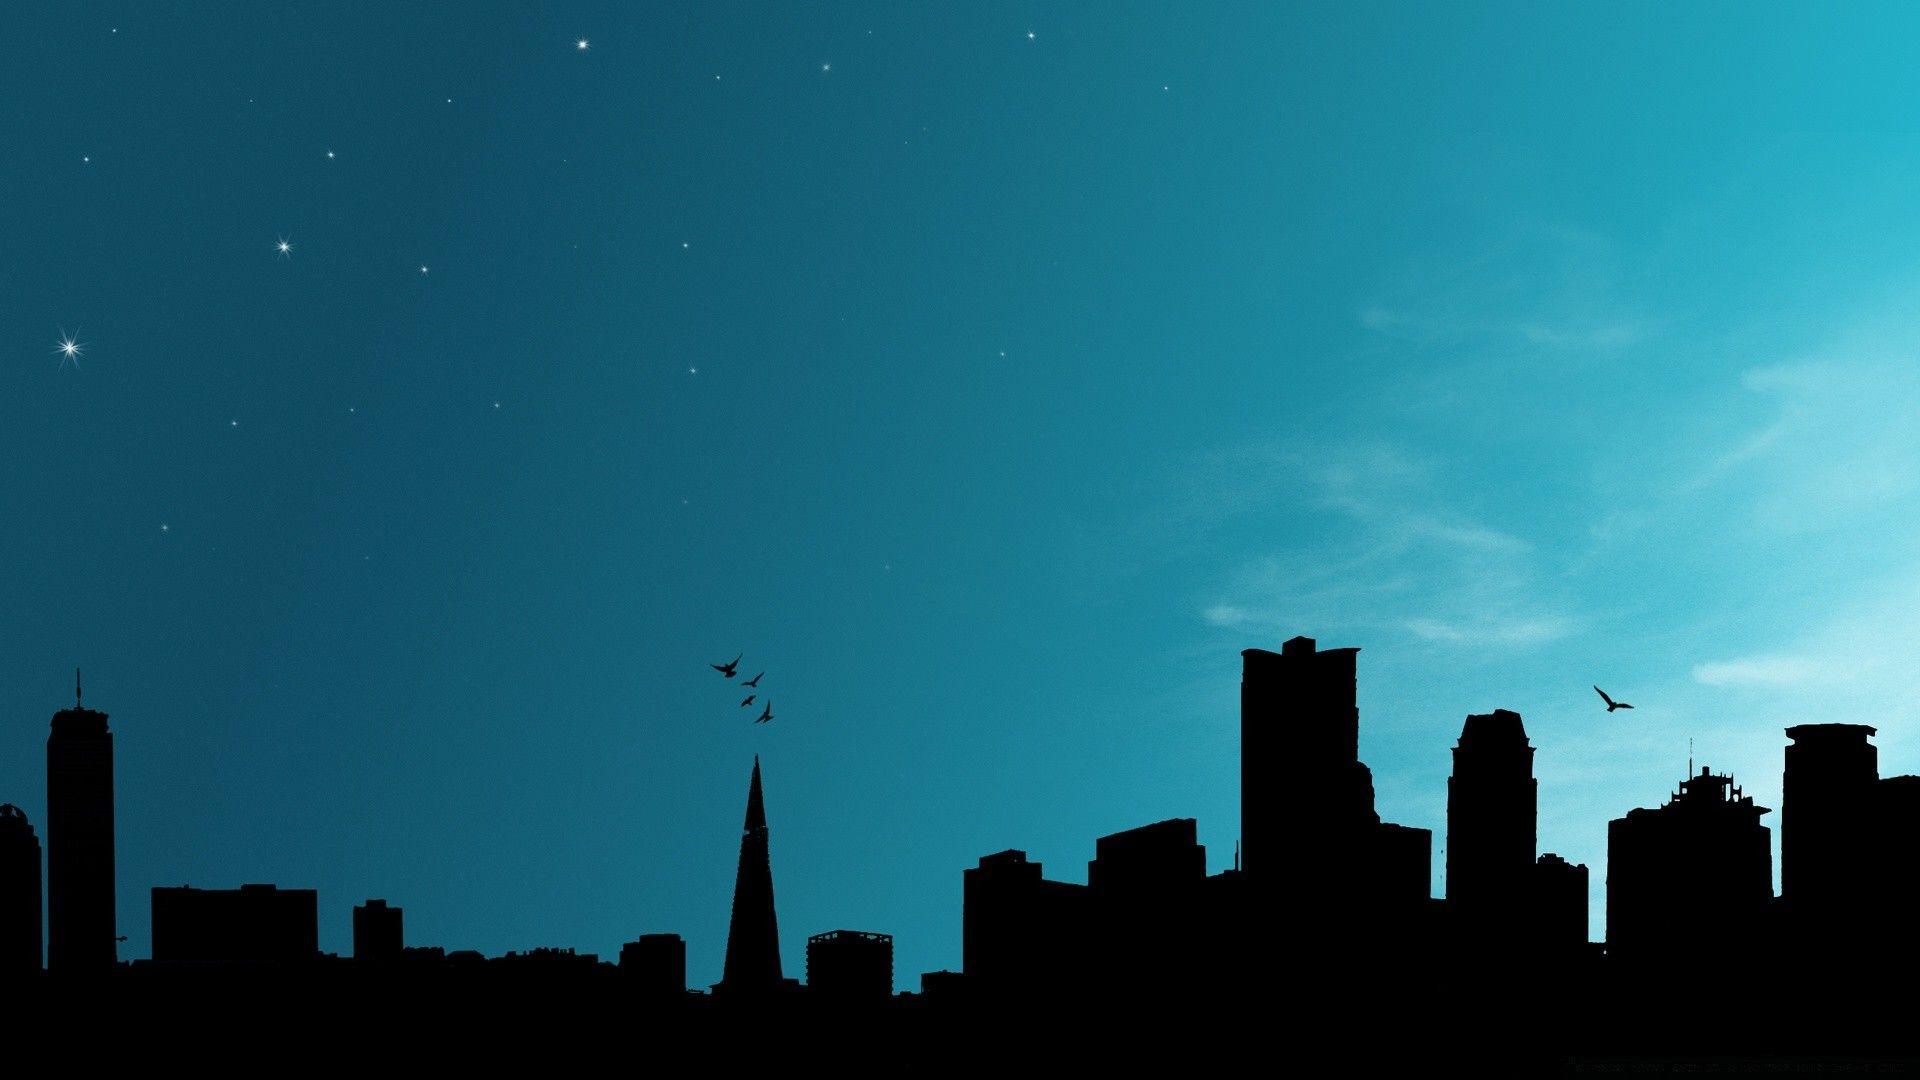 Silhouette Of The Night City Skyline Siluet